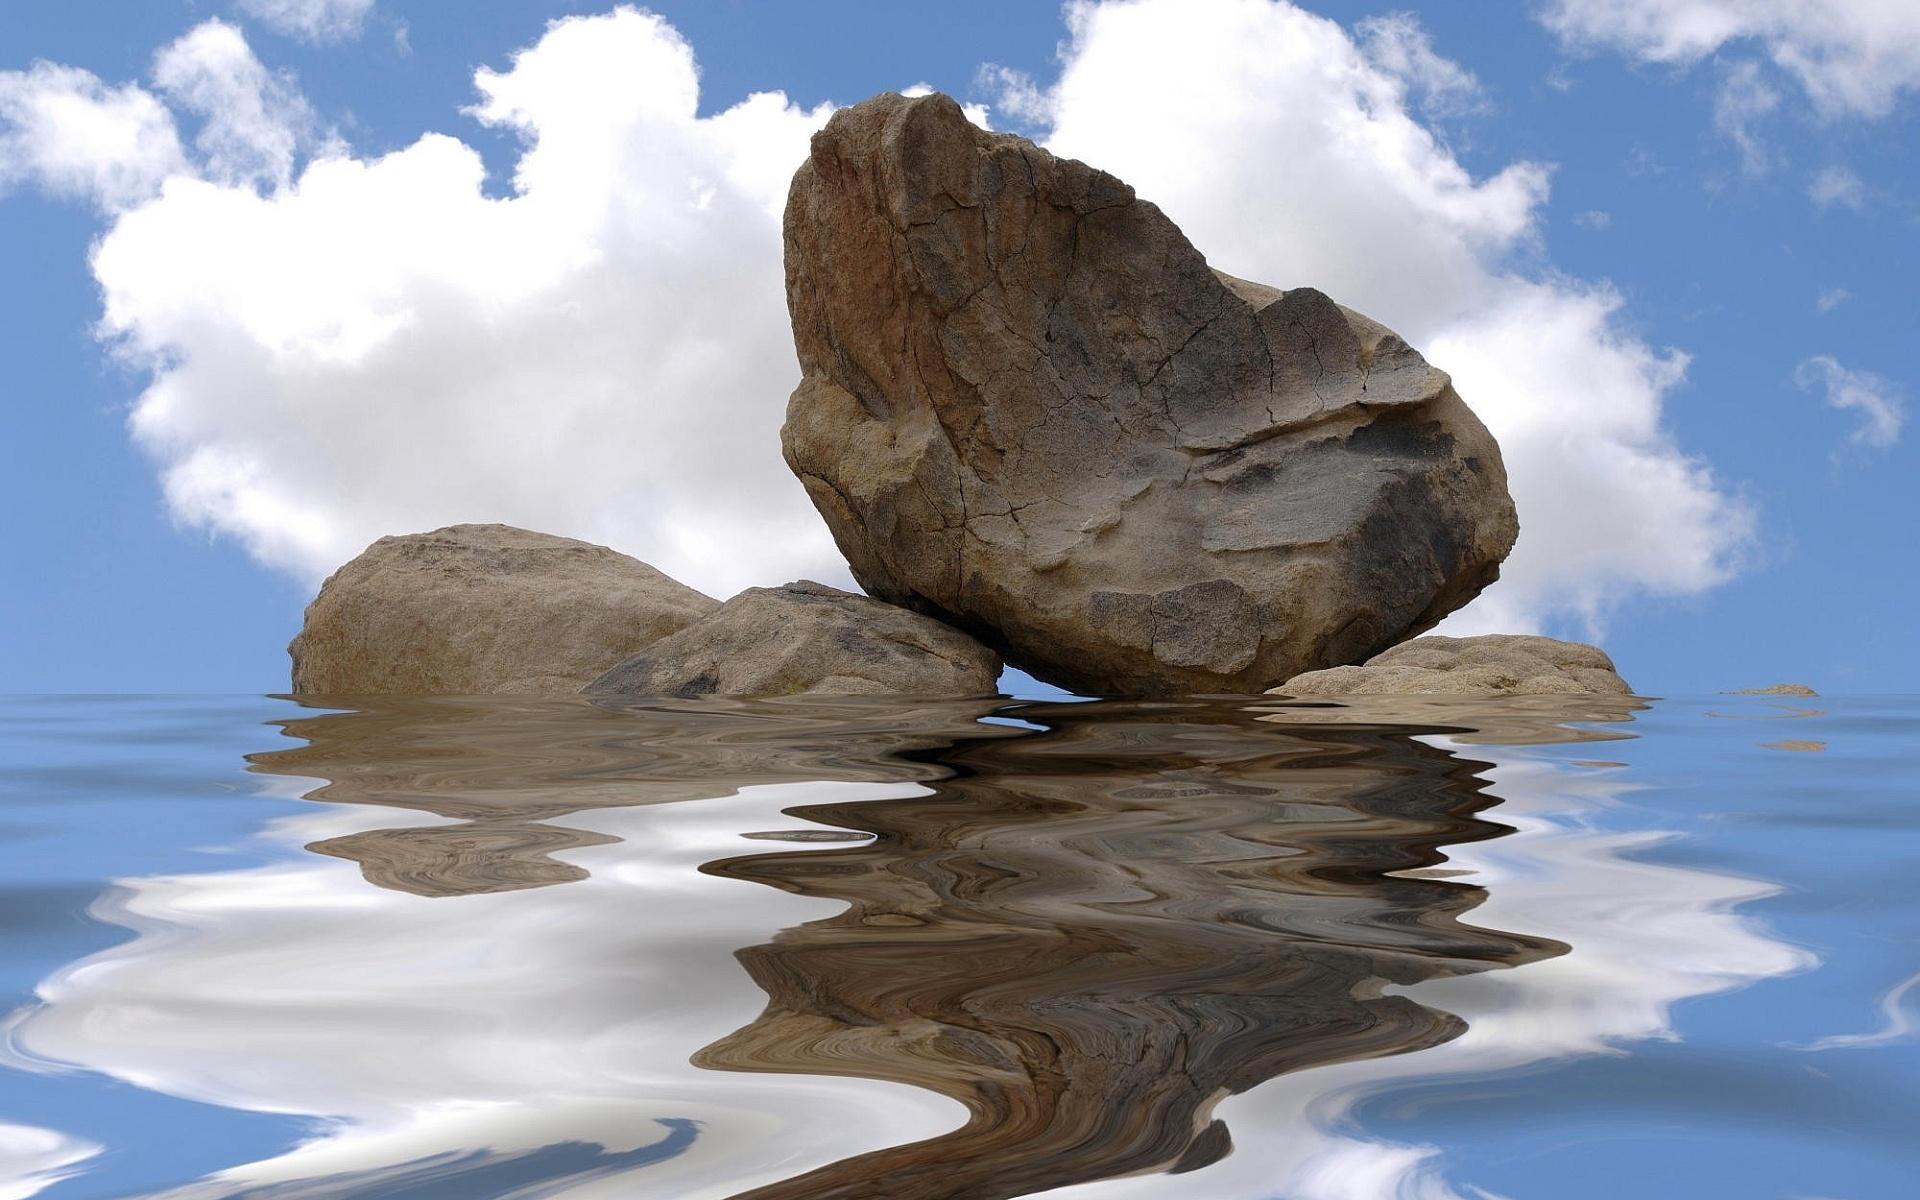 Stone water reflection